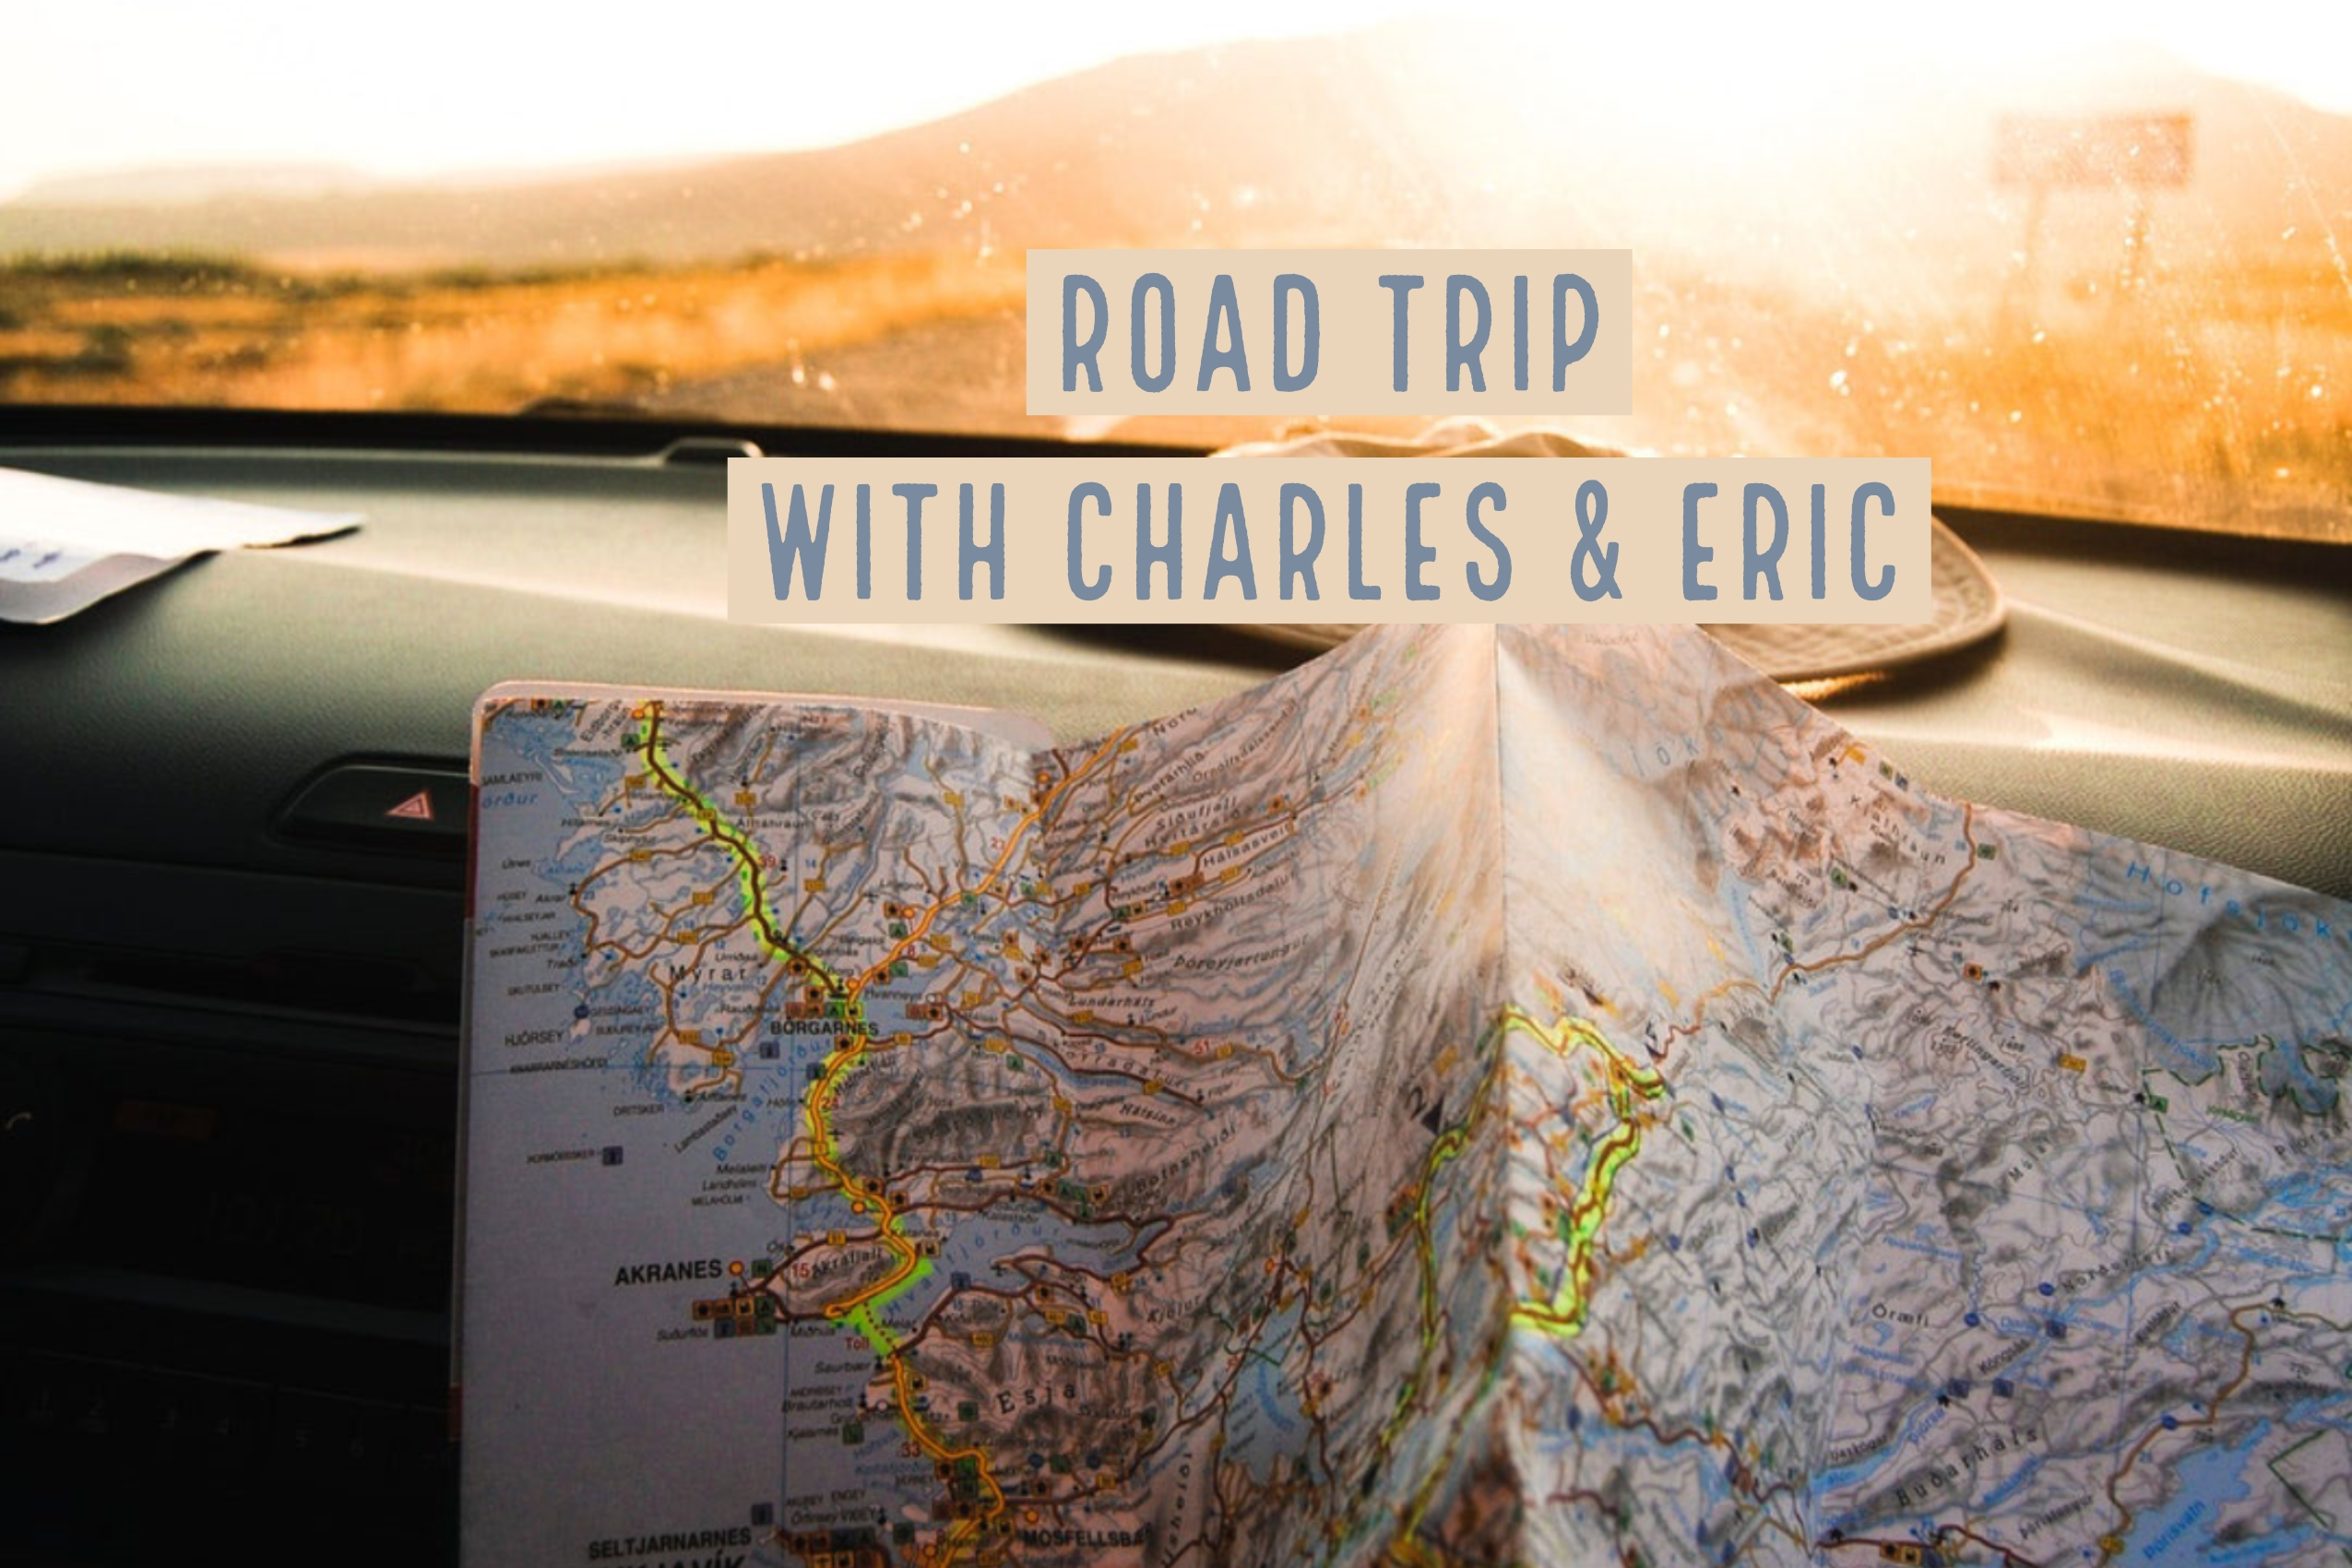 Episode 46: Roadtrip!